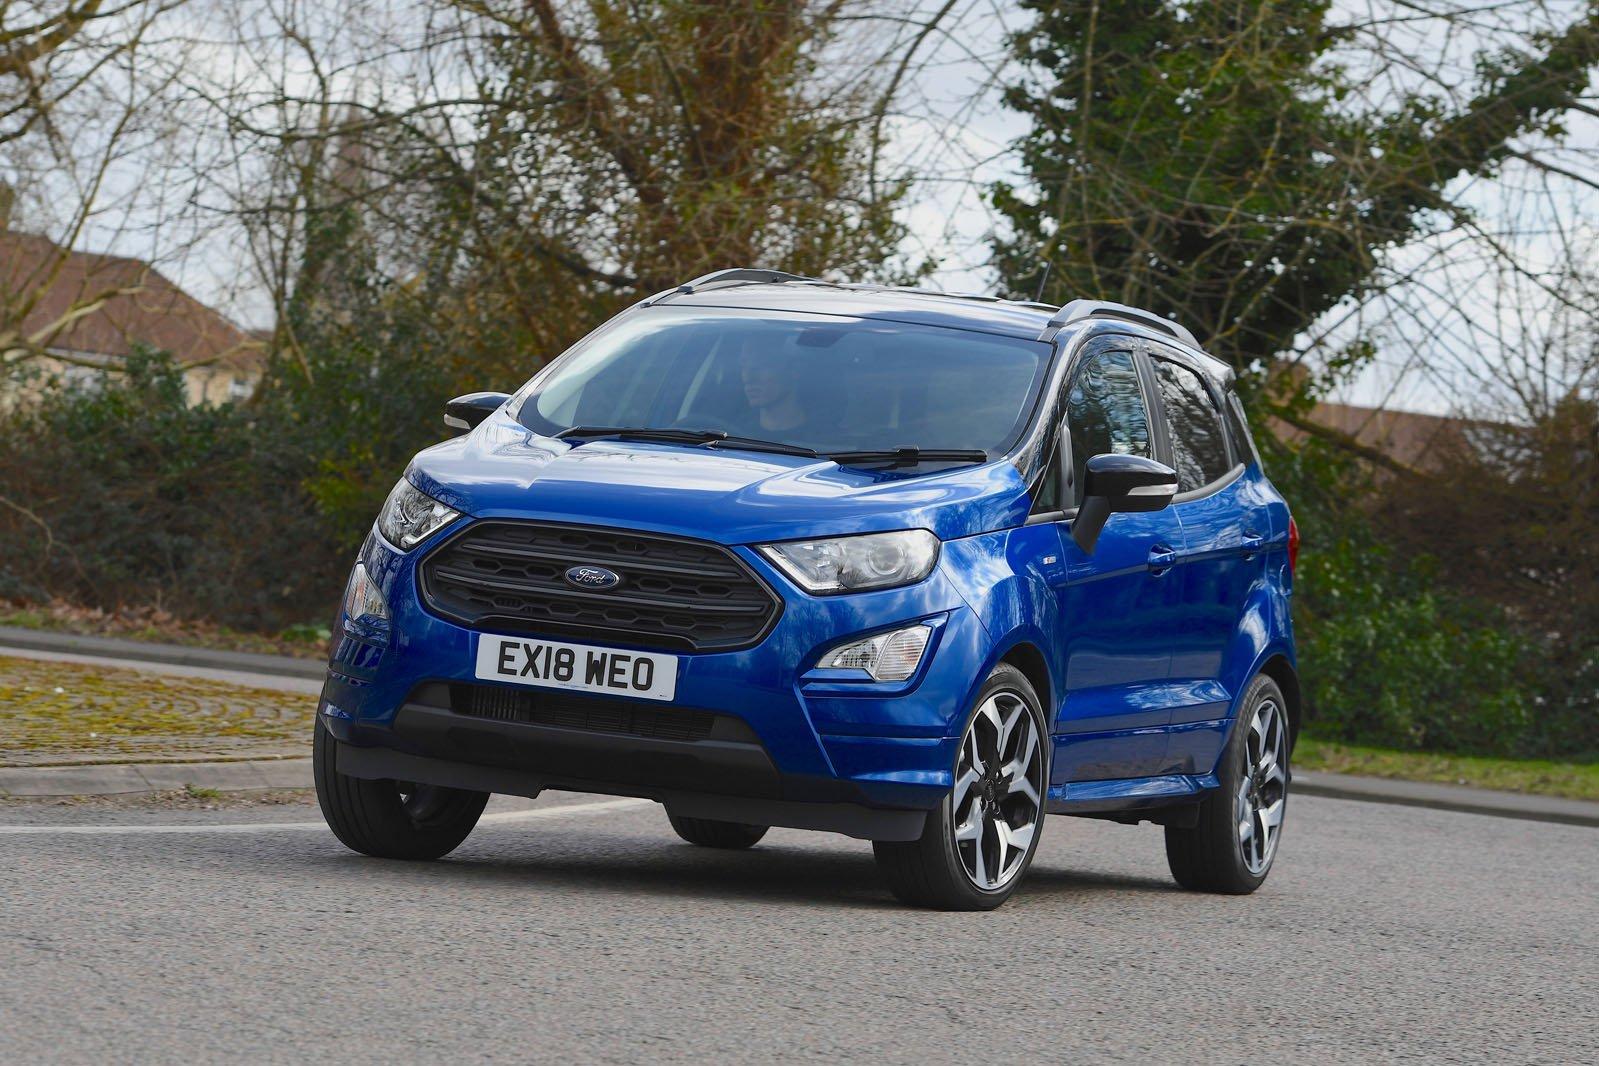 Ford Ecosport 2018 RHD front left tracking shot